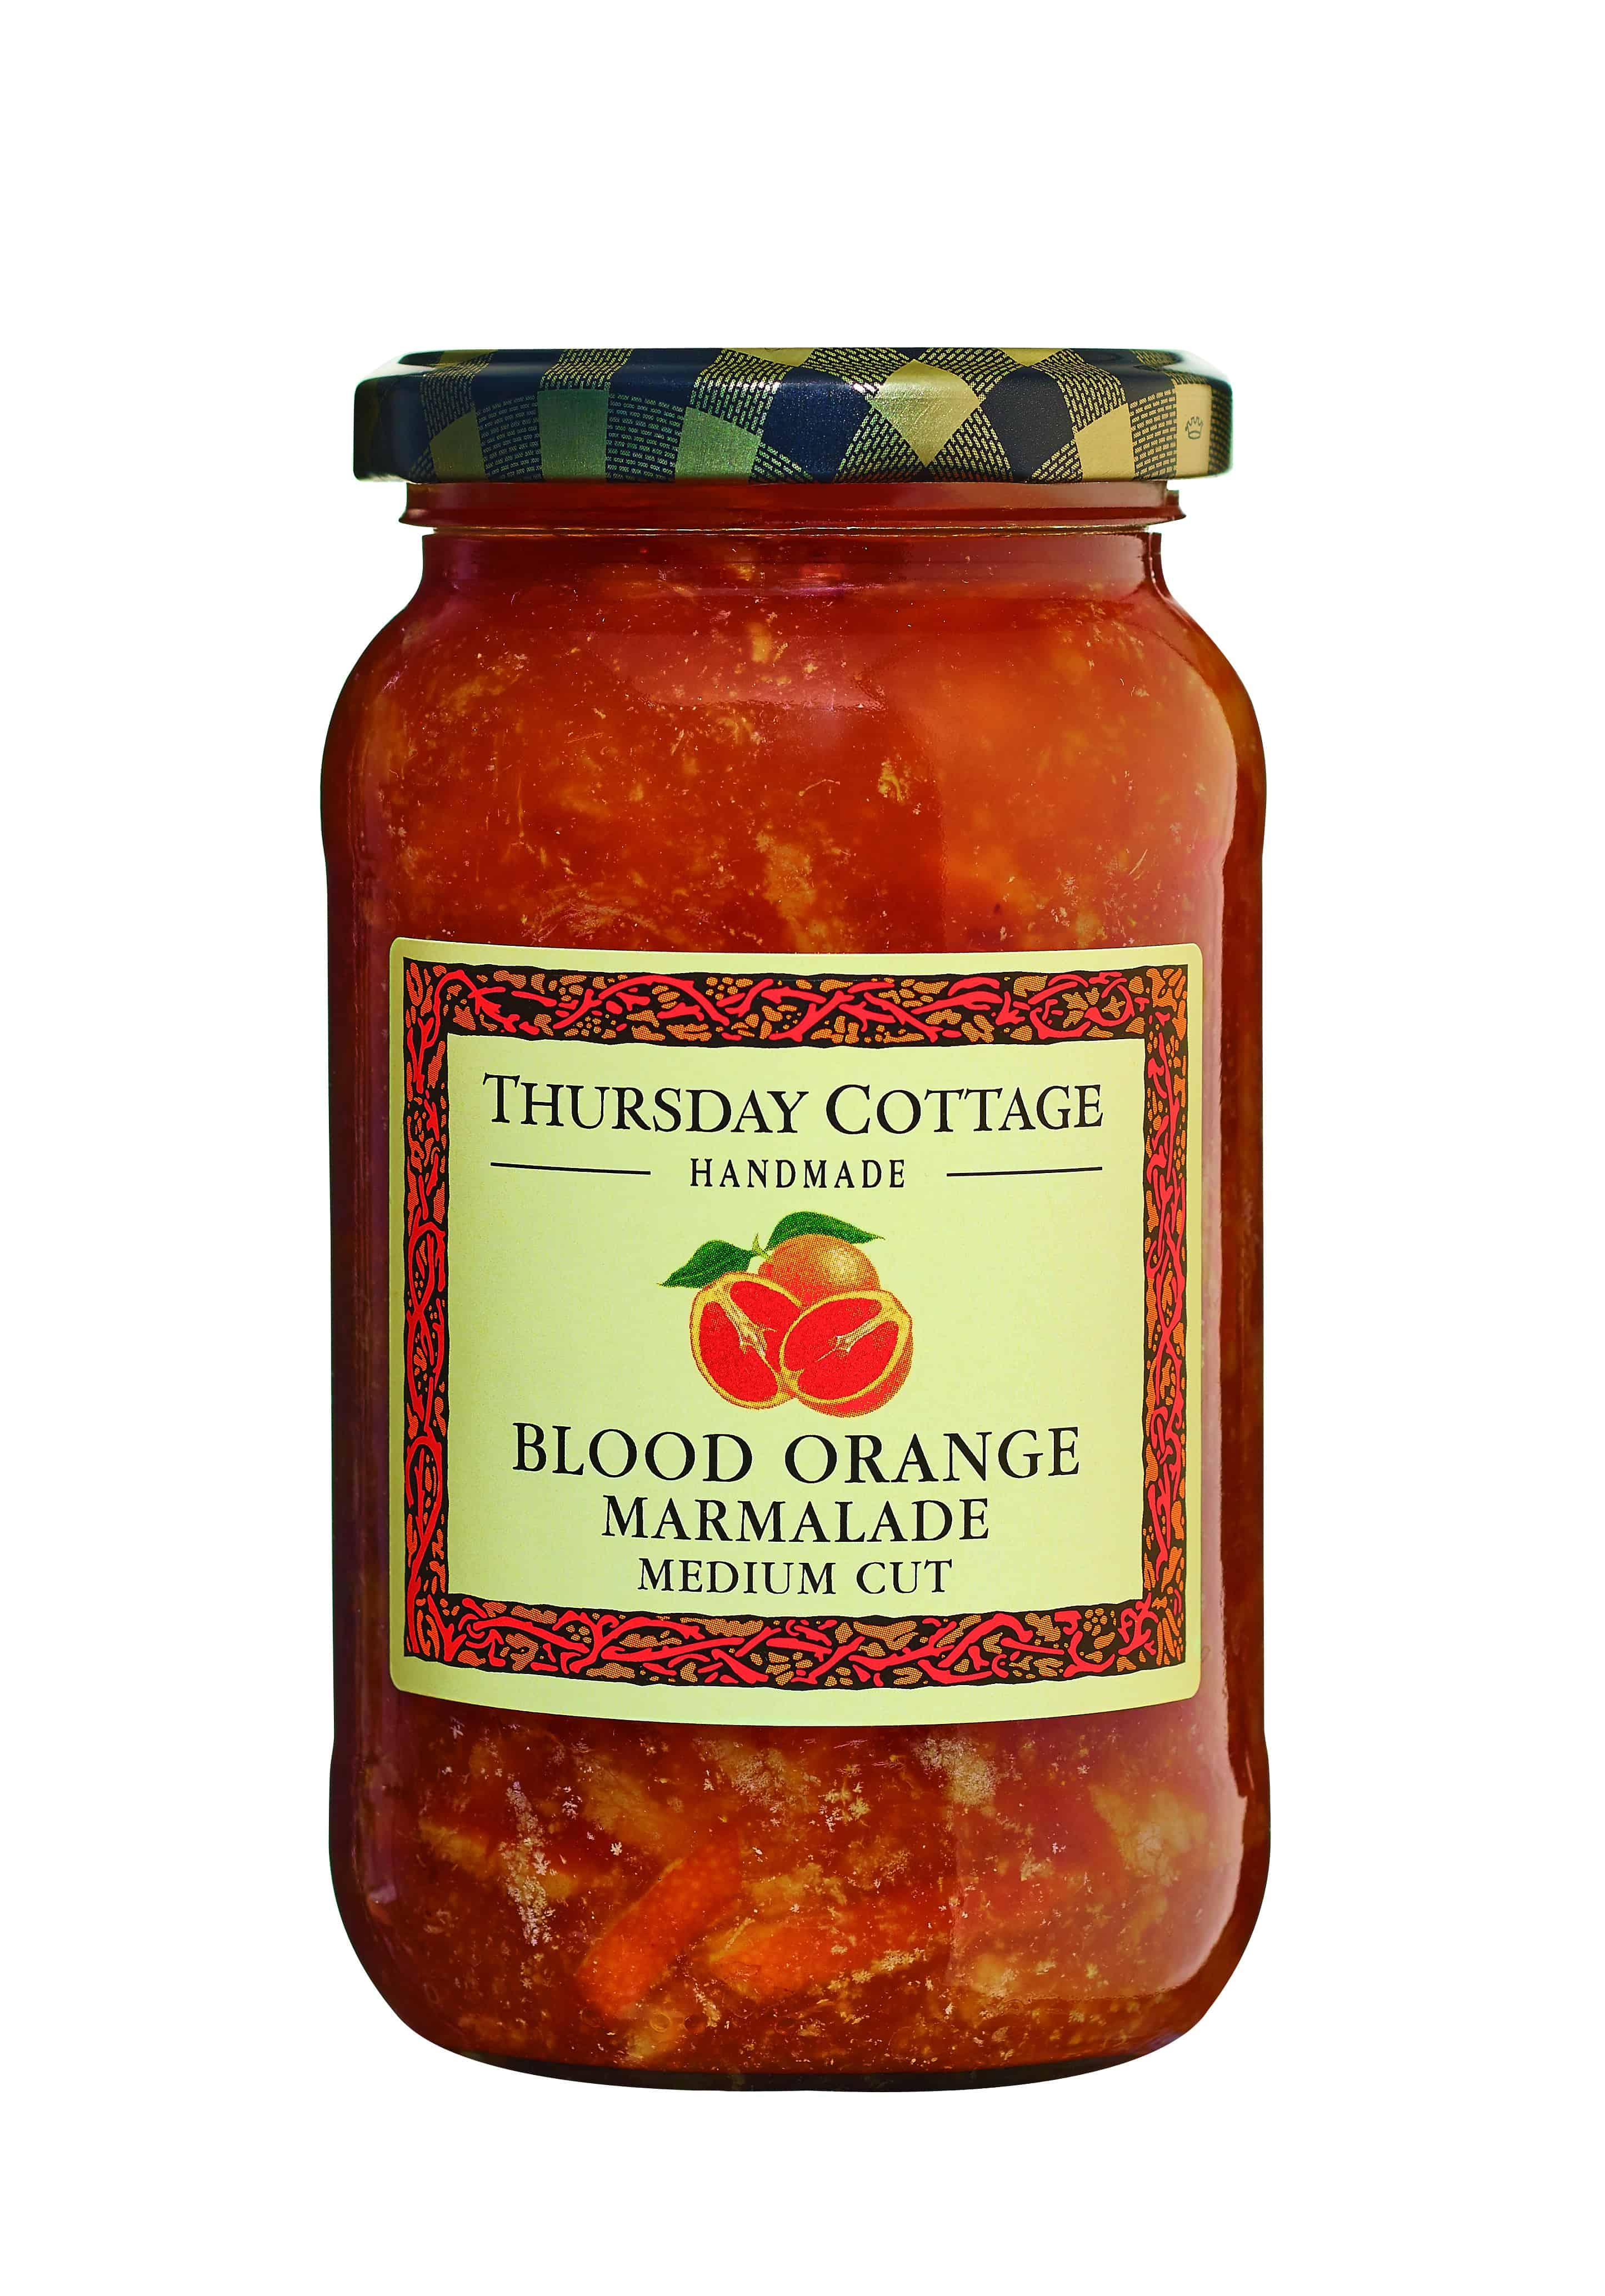 Blood Orange Marmalade 454g.1